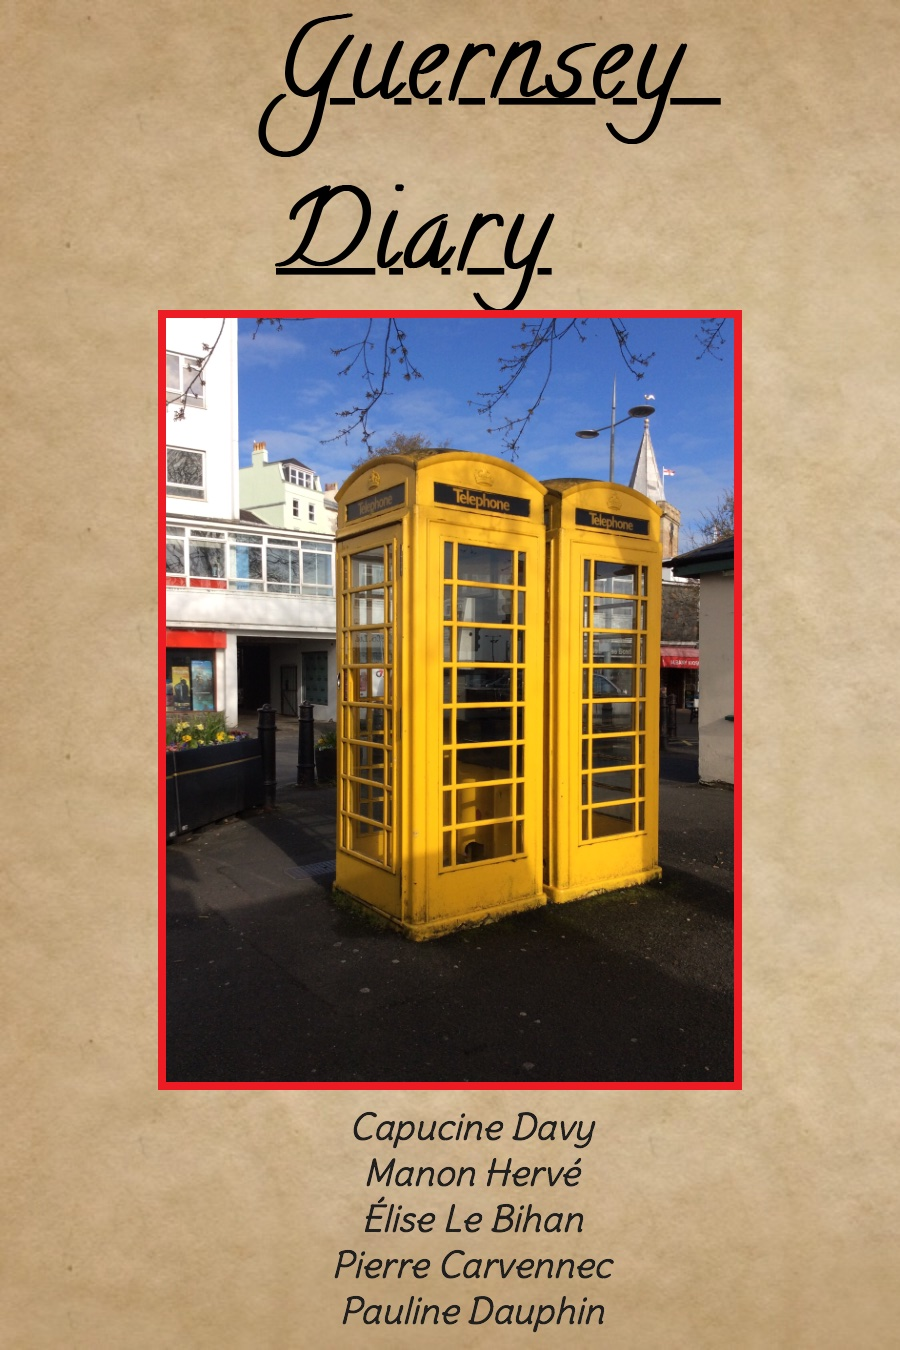 Guernsey Diary